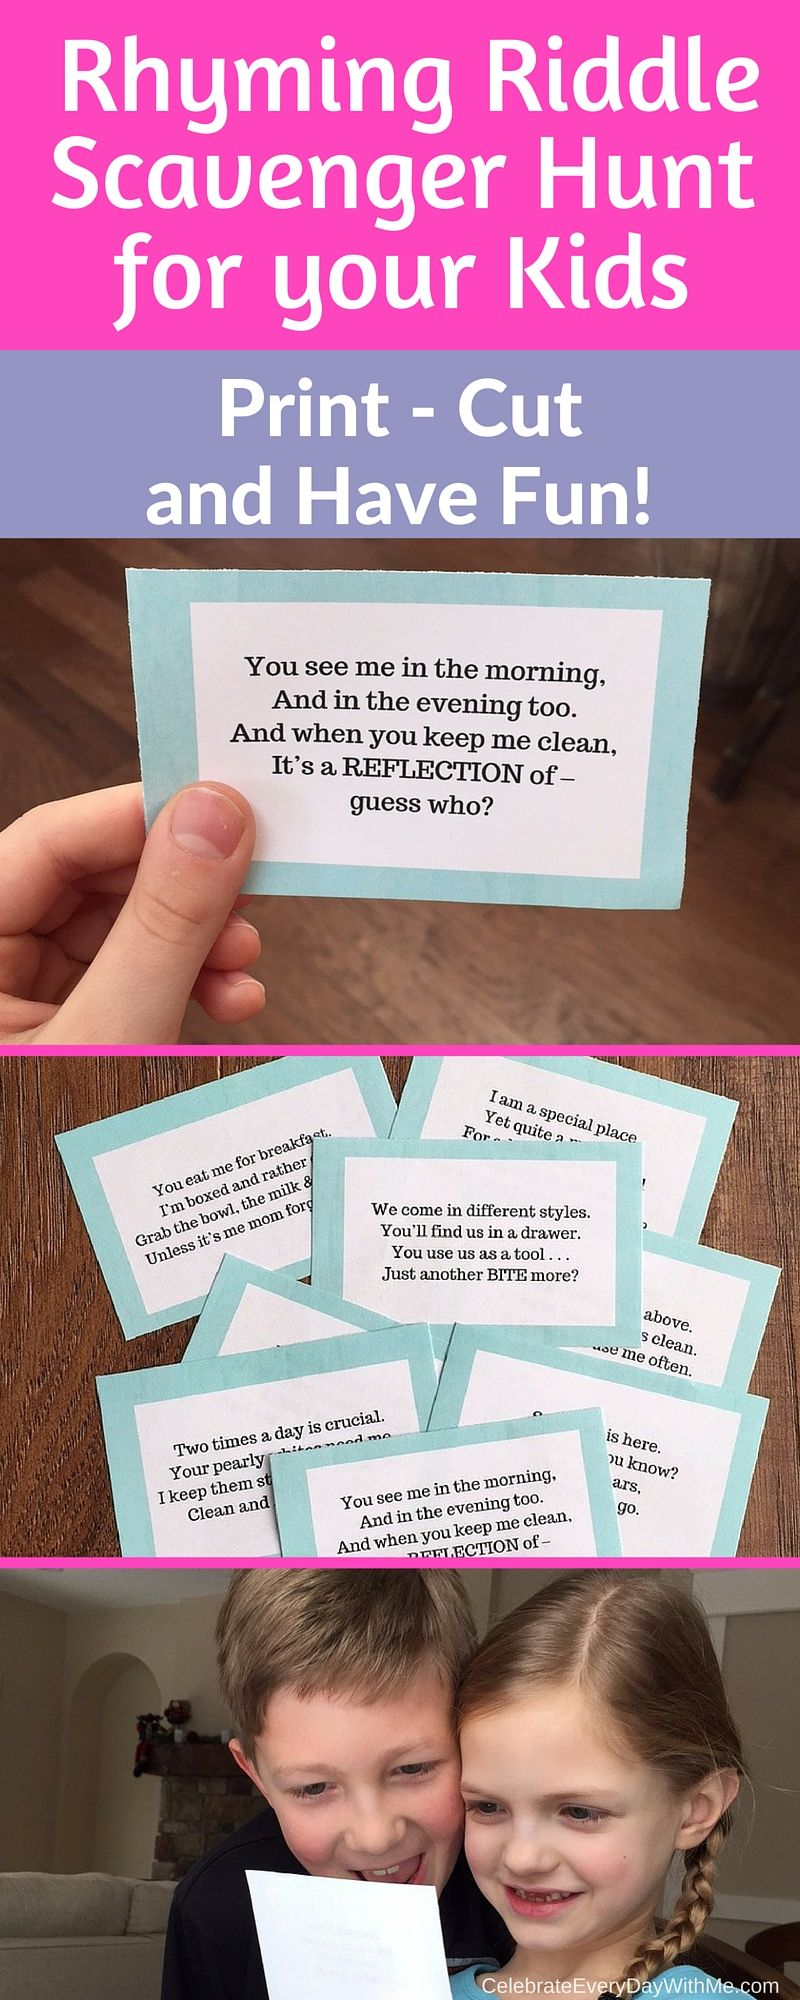 Rhyming Riddle Scavenger Hunt for your kids. Print, cut